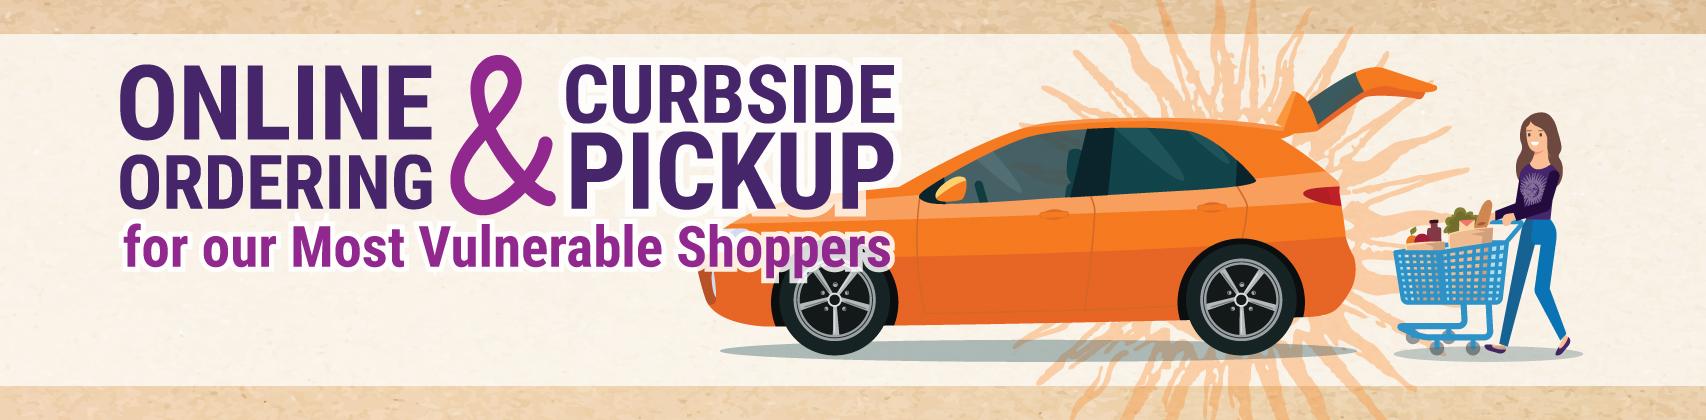 Curbside-Pickup_WEB-Banner